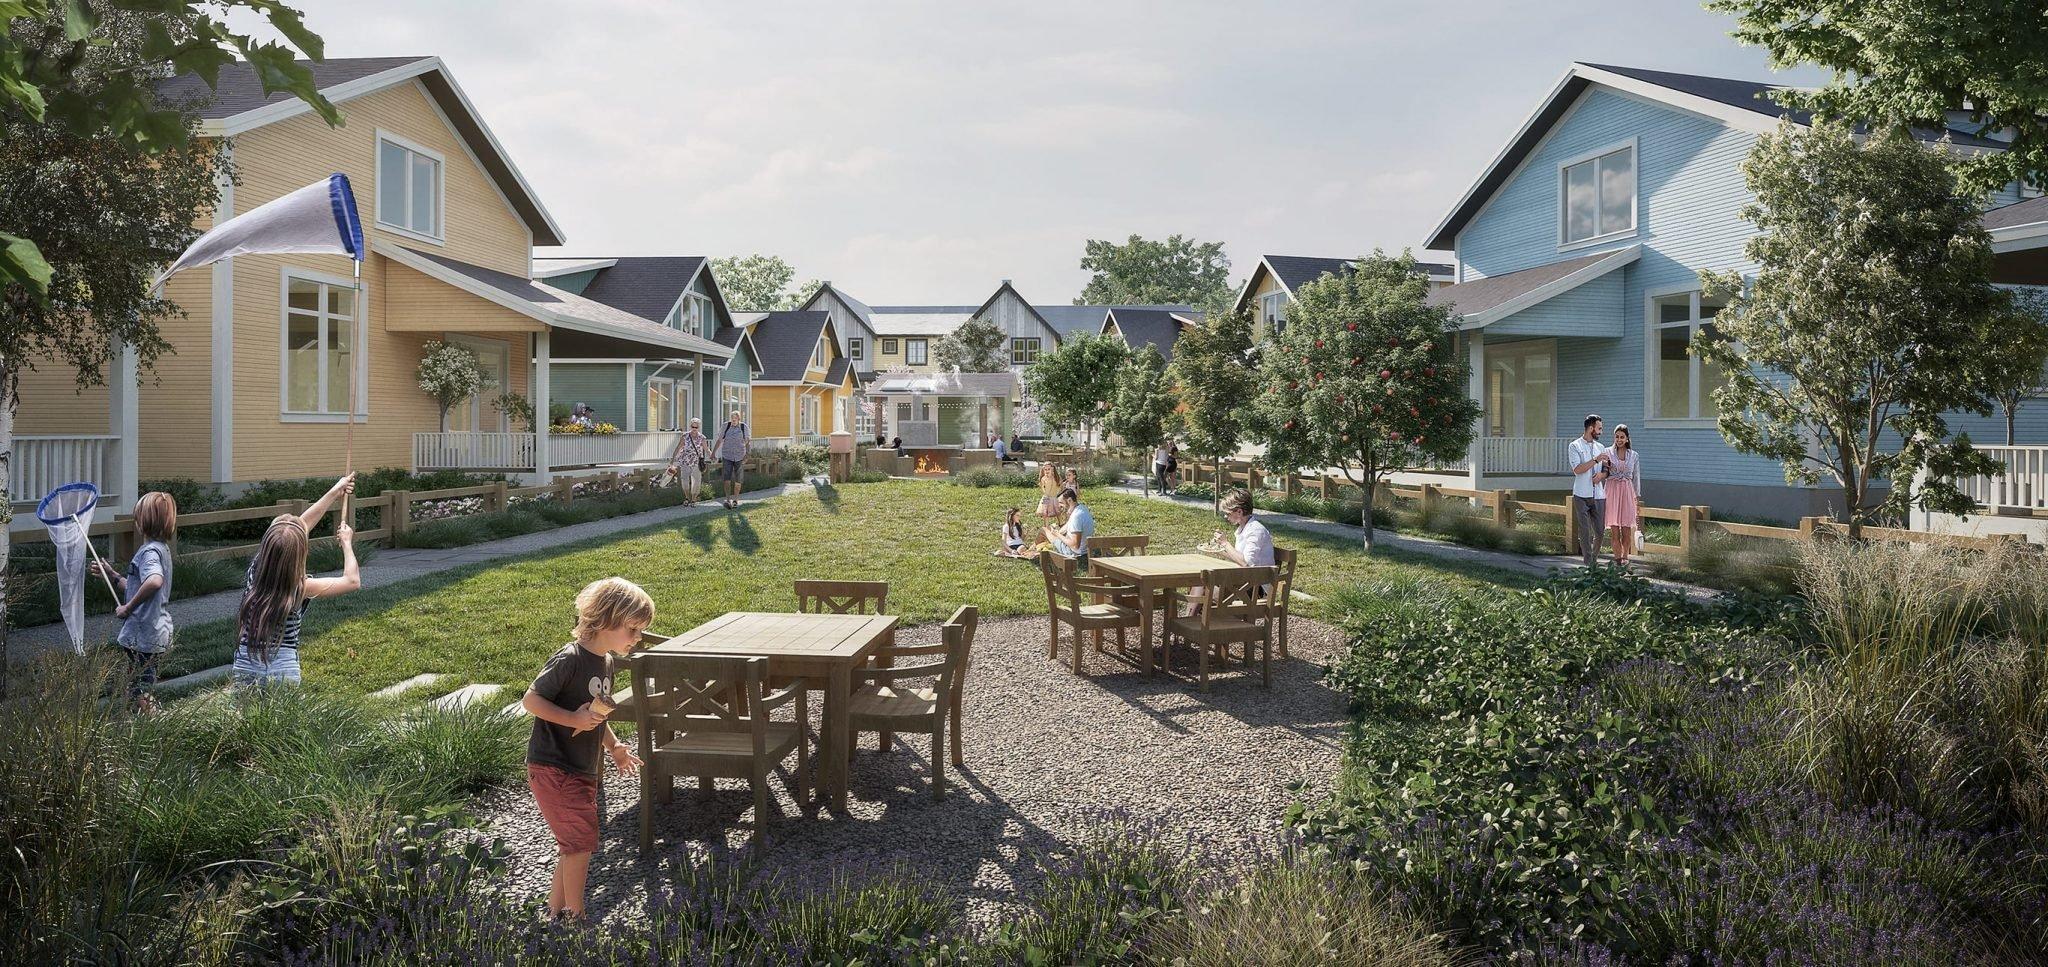 Southlands Courtyard Cottages - 263 Parkside St, Tsawwassen, BC V4L 0A9, Canada!